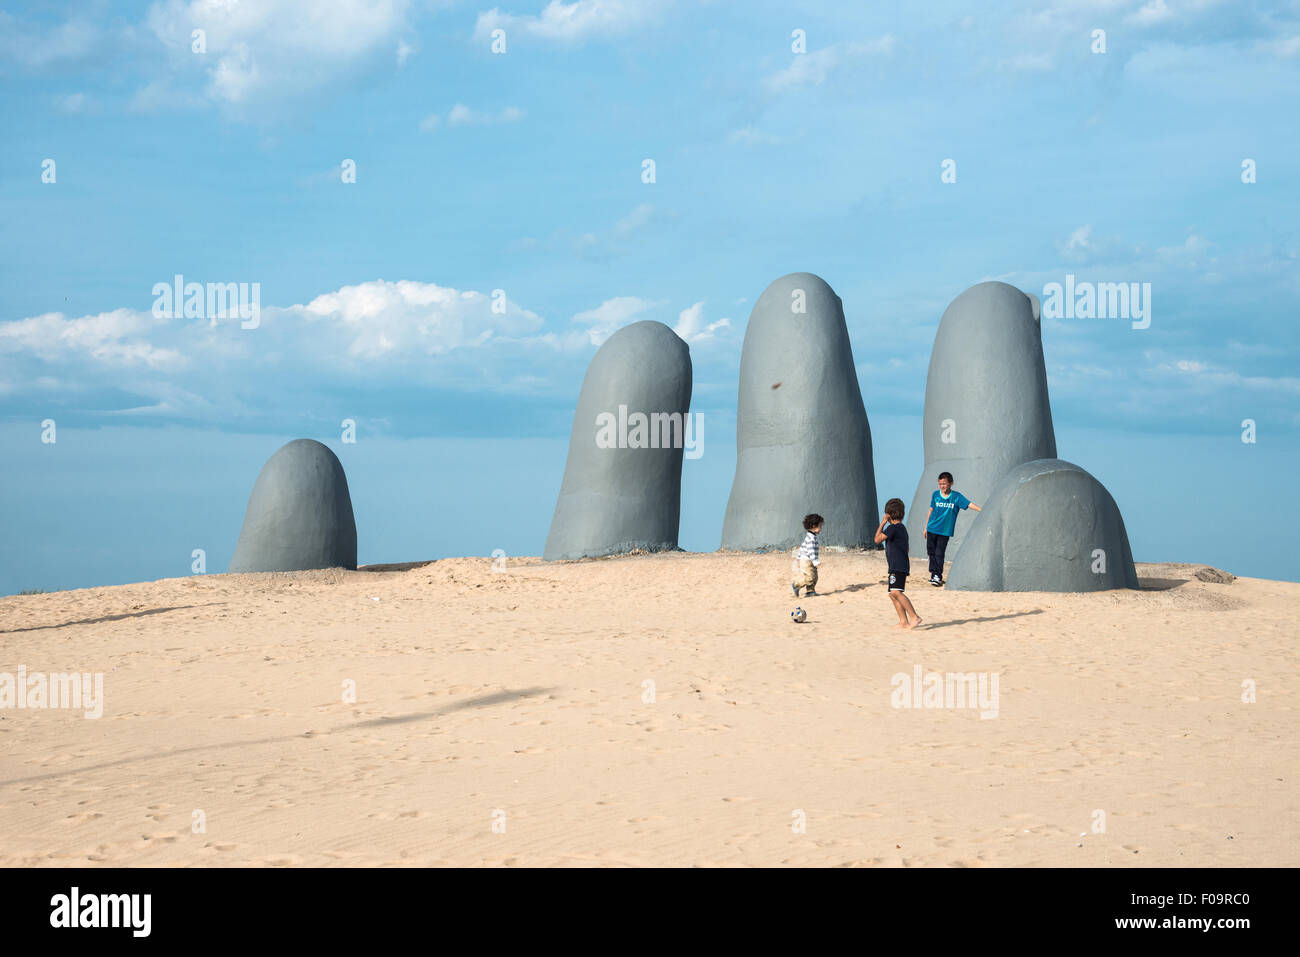 Hand Sculpture, the symbol of Punta del Este, Uruguay - Stock Image